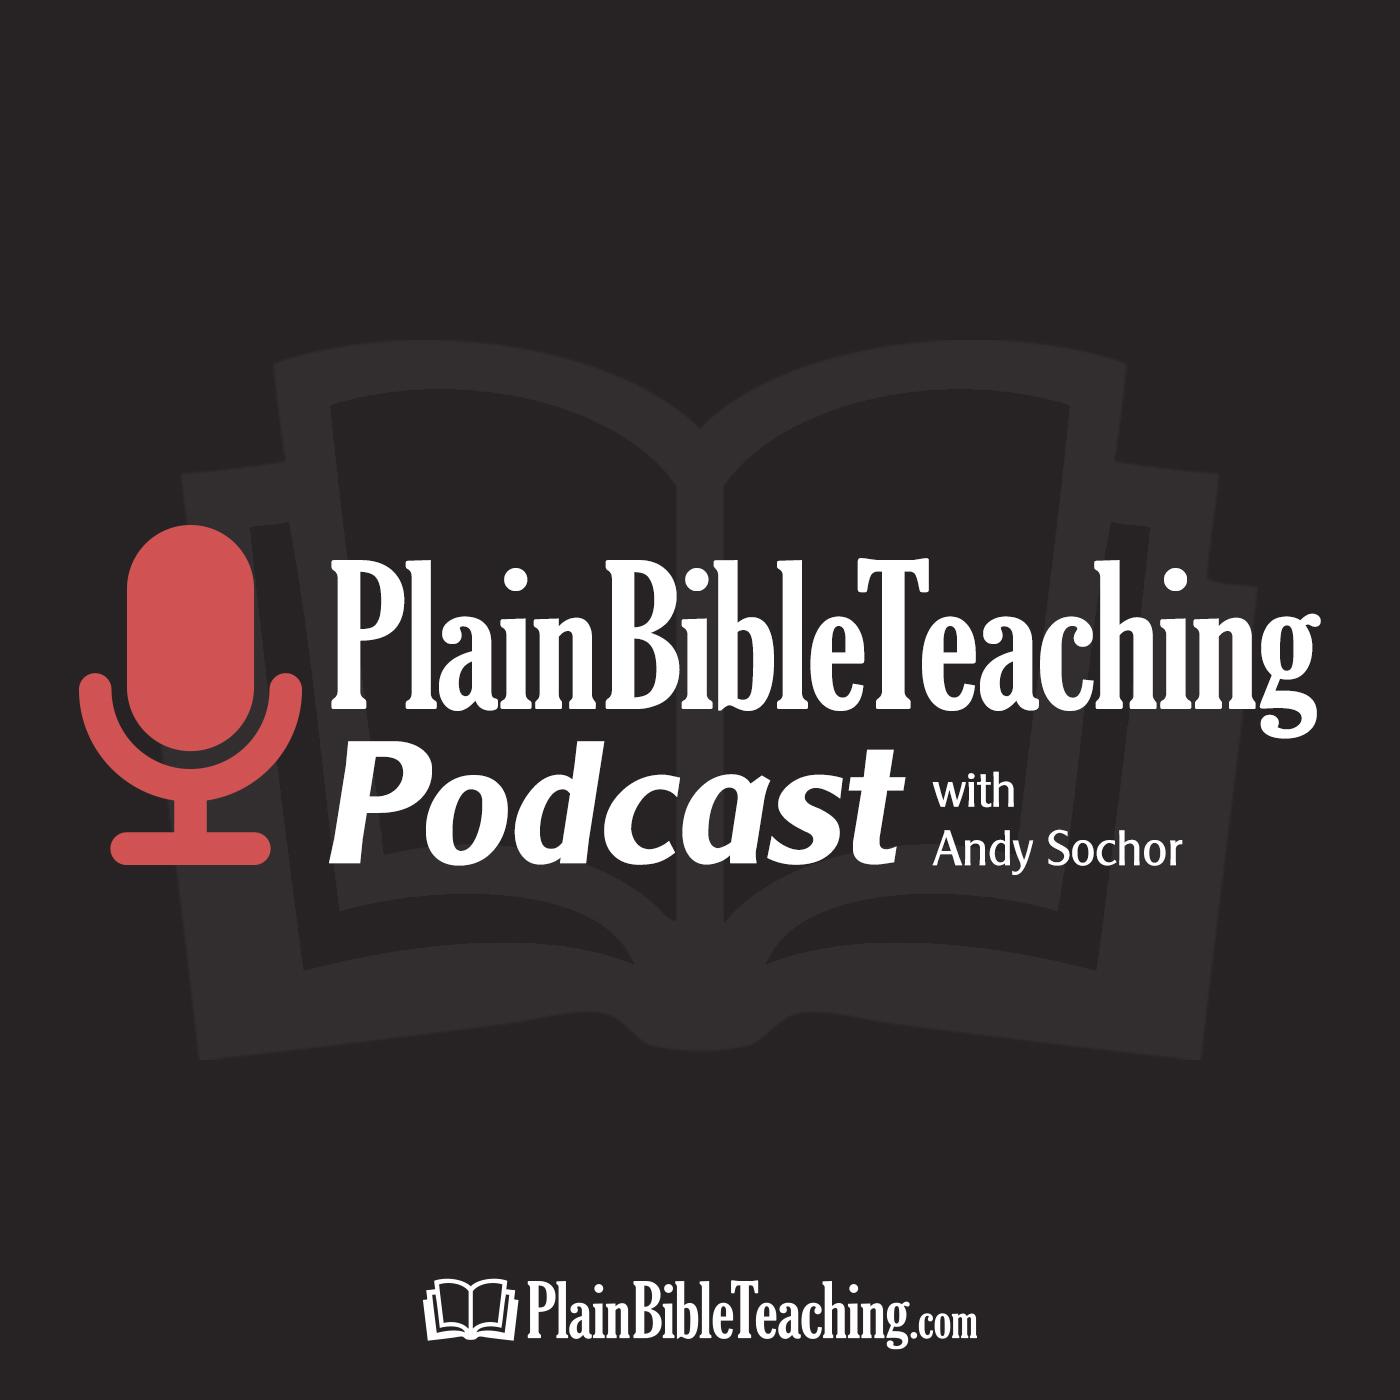 Plain Bible Teaching Podcast